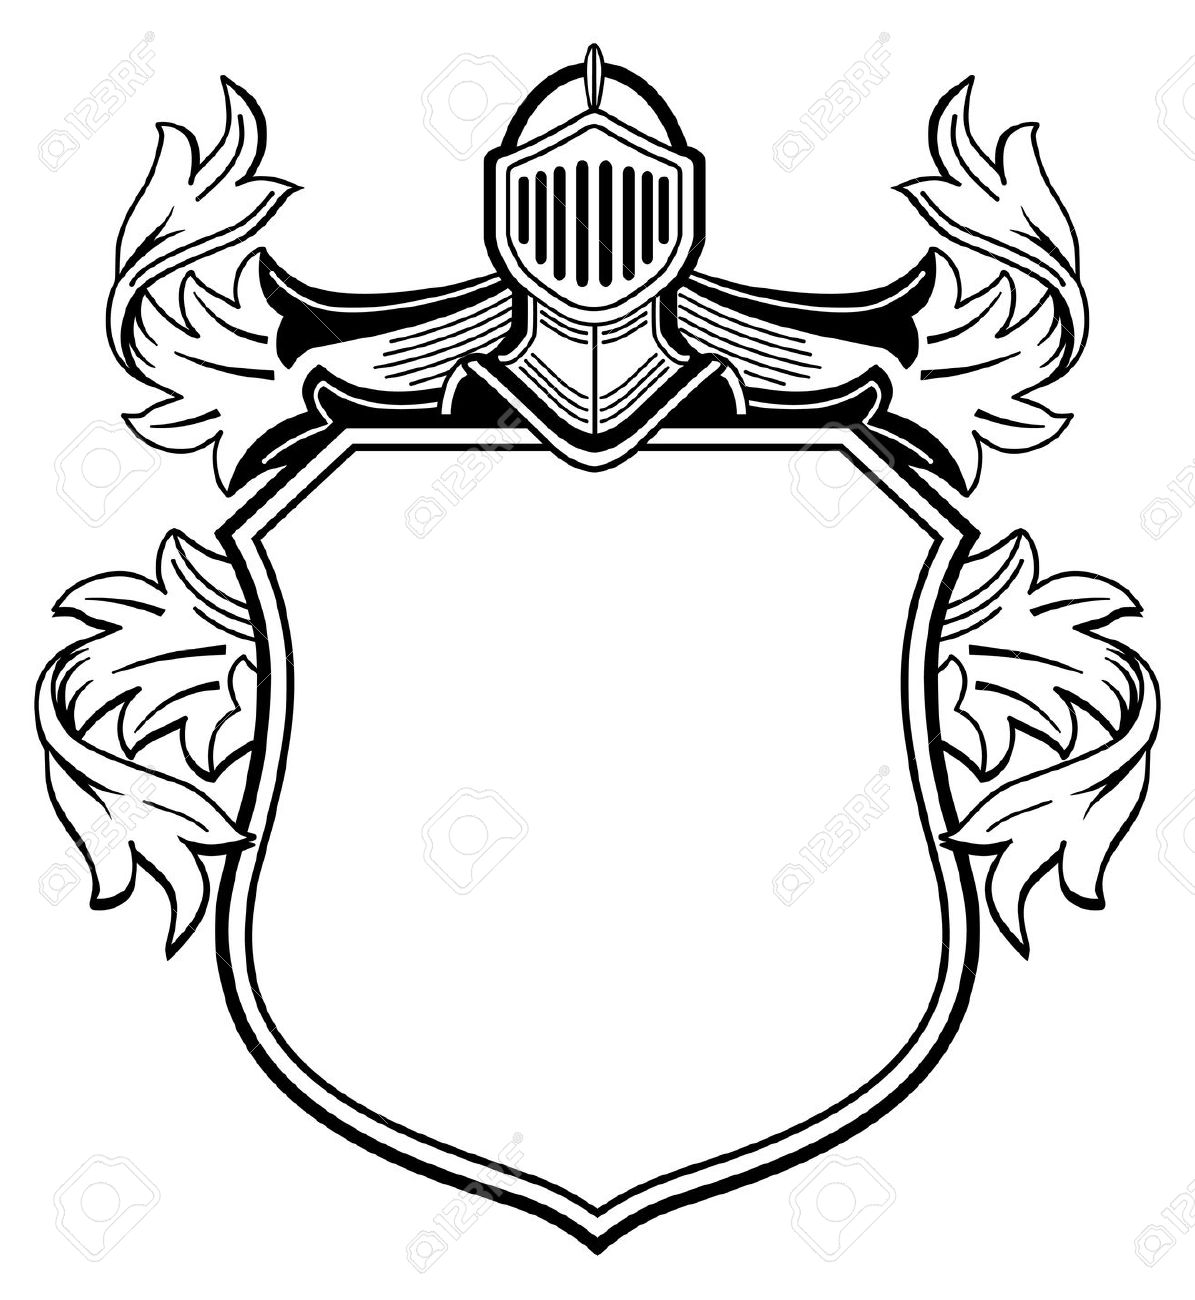 1195x1300 Drawn Shield Medieval Time